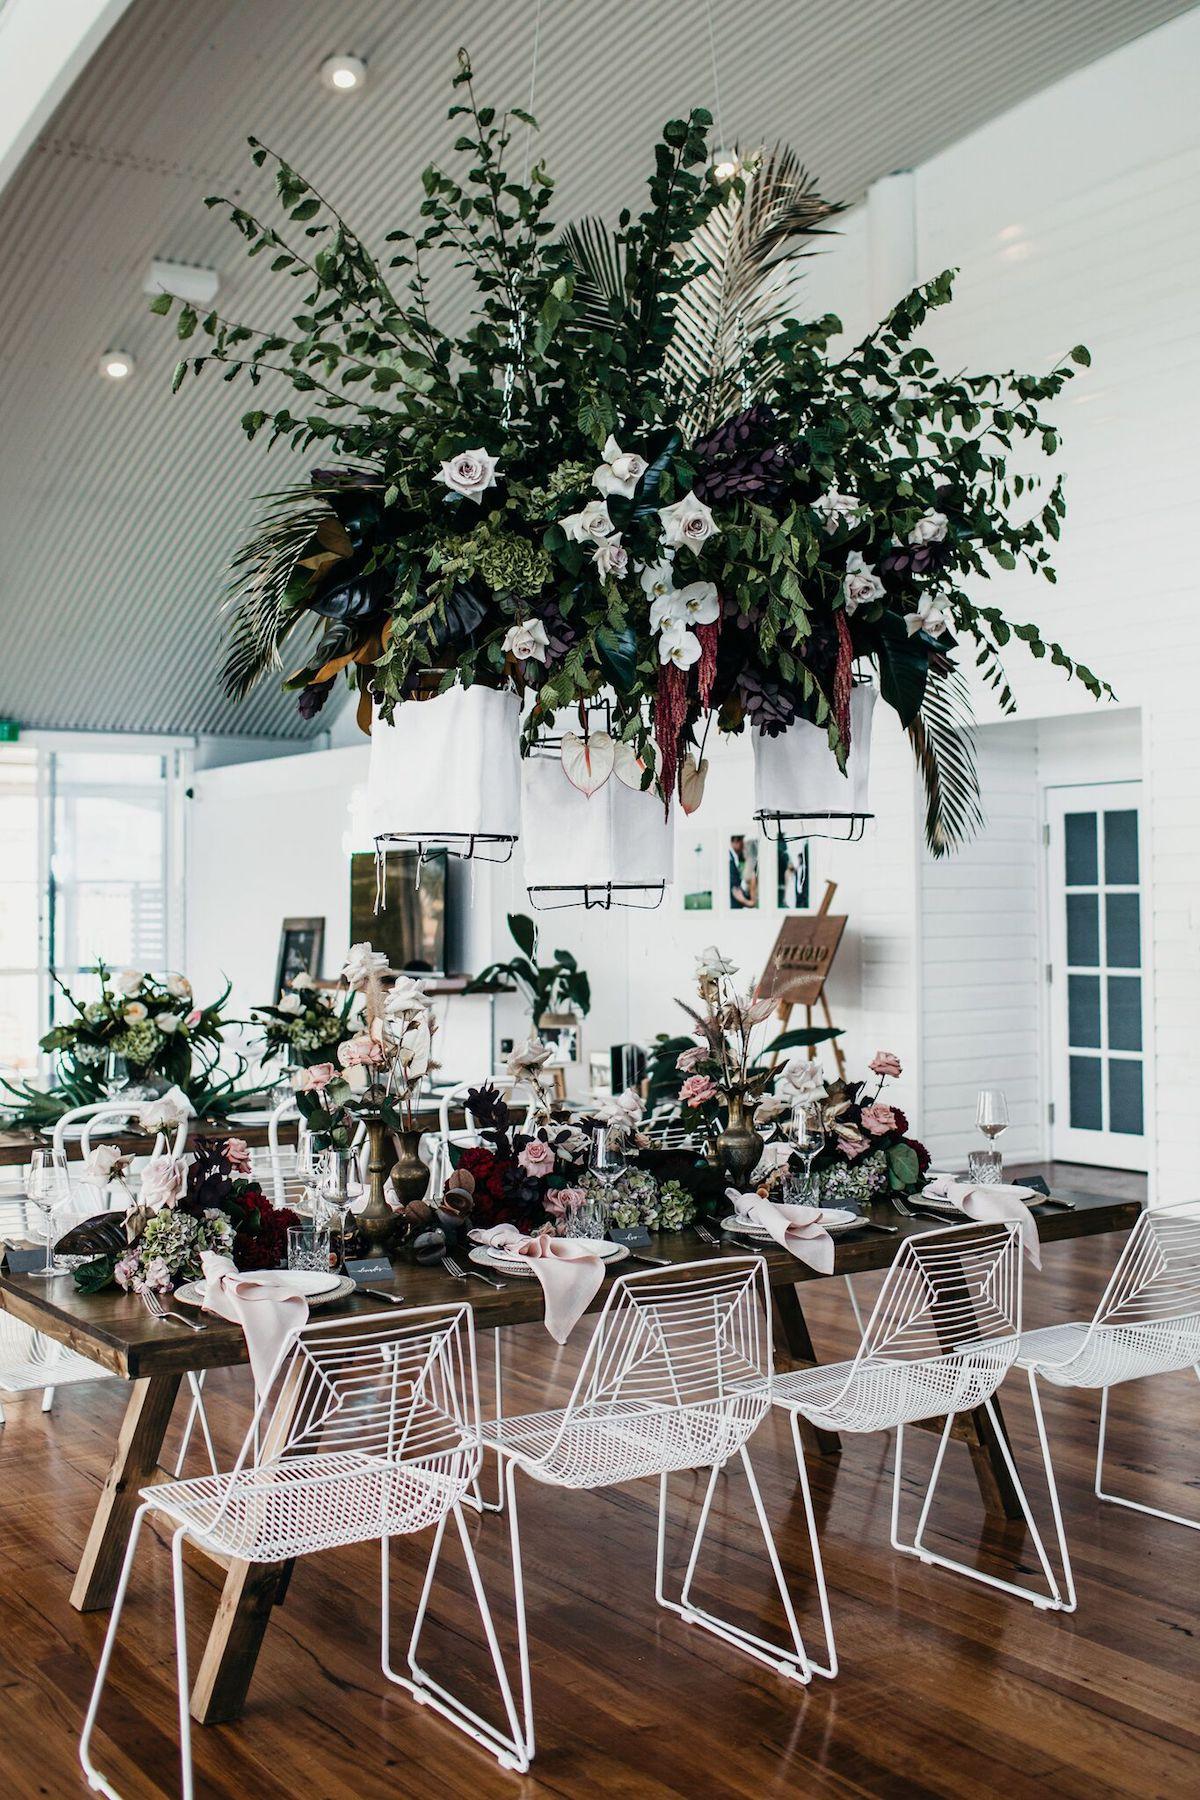 Linen Napkin Hire Wedding Styling Inspiration29.jpeg